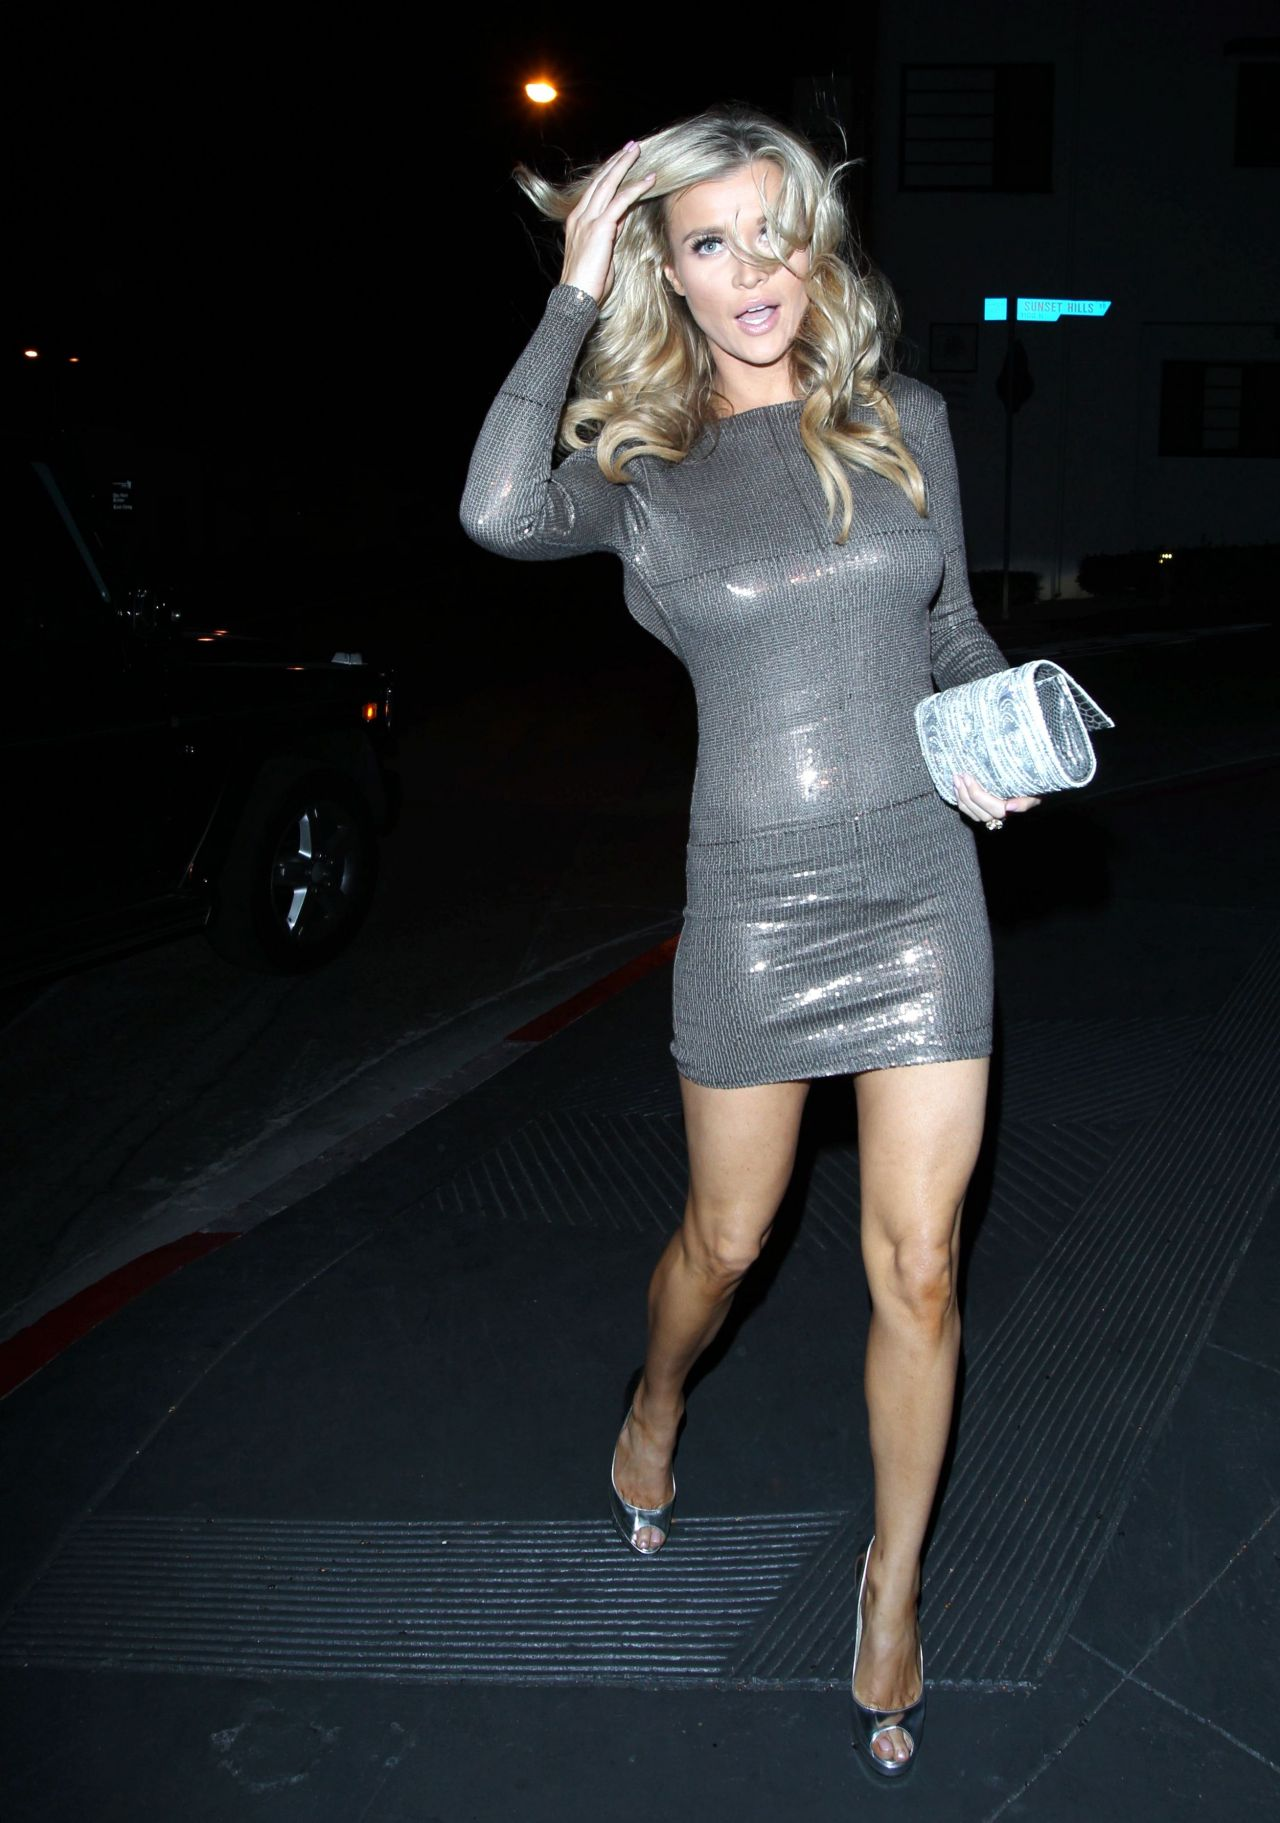 Nude celebrity dress up